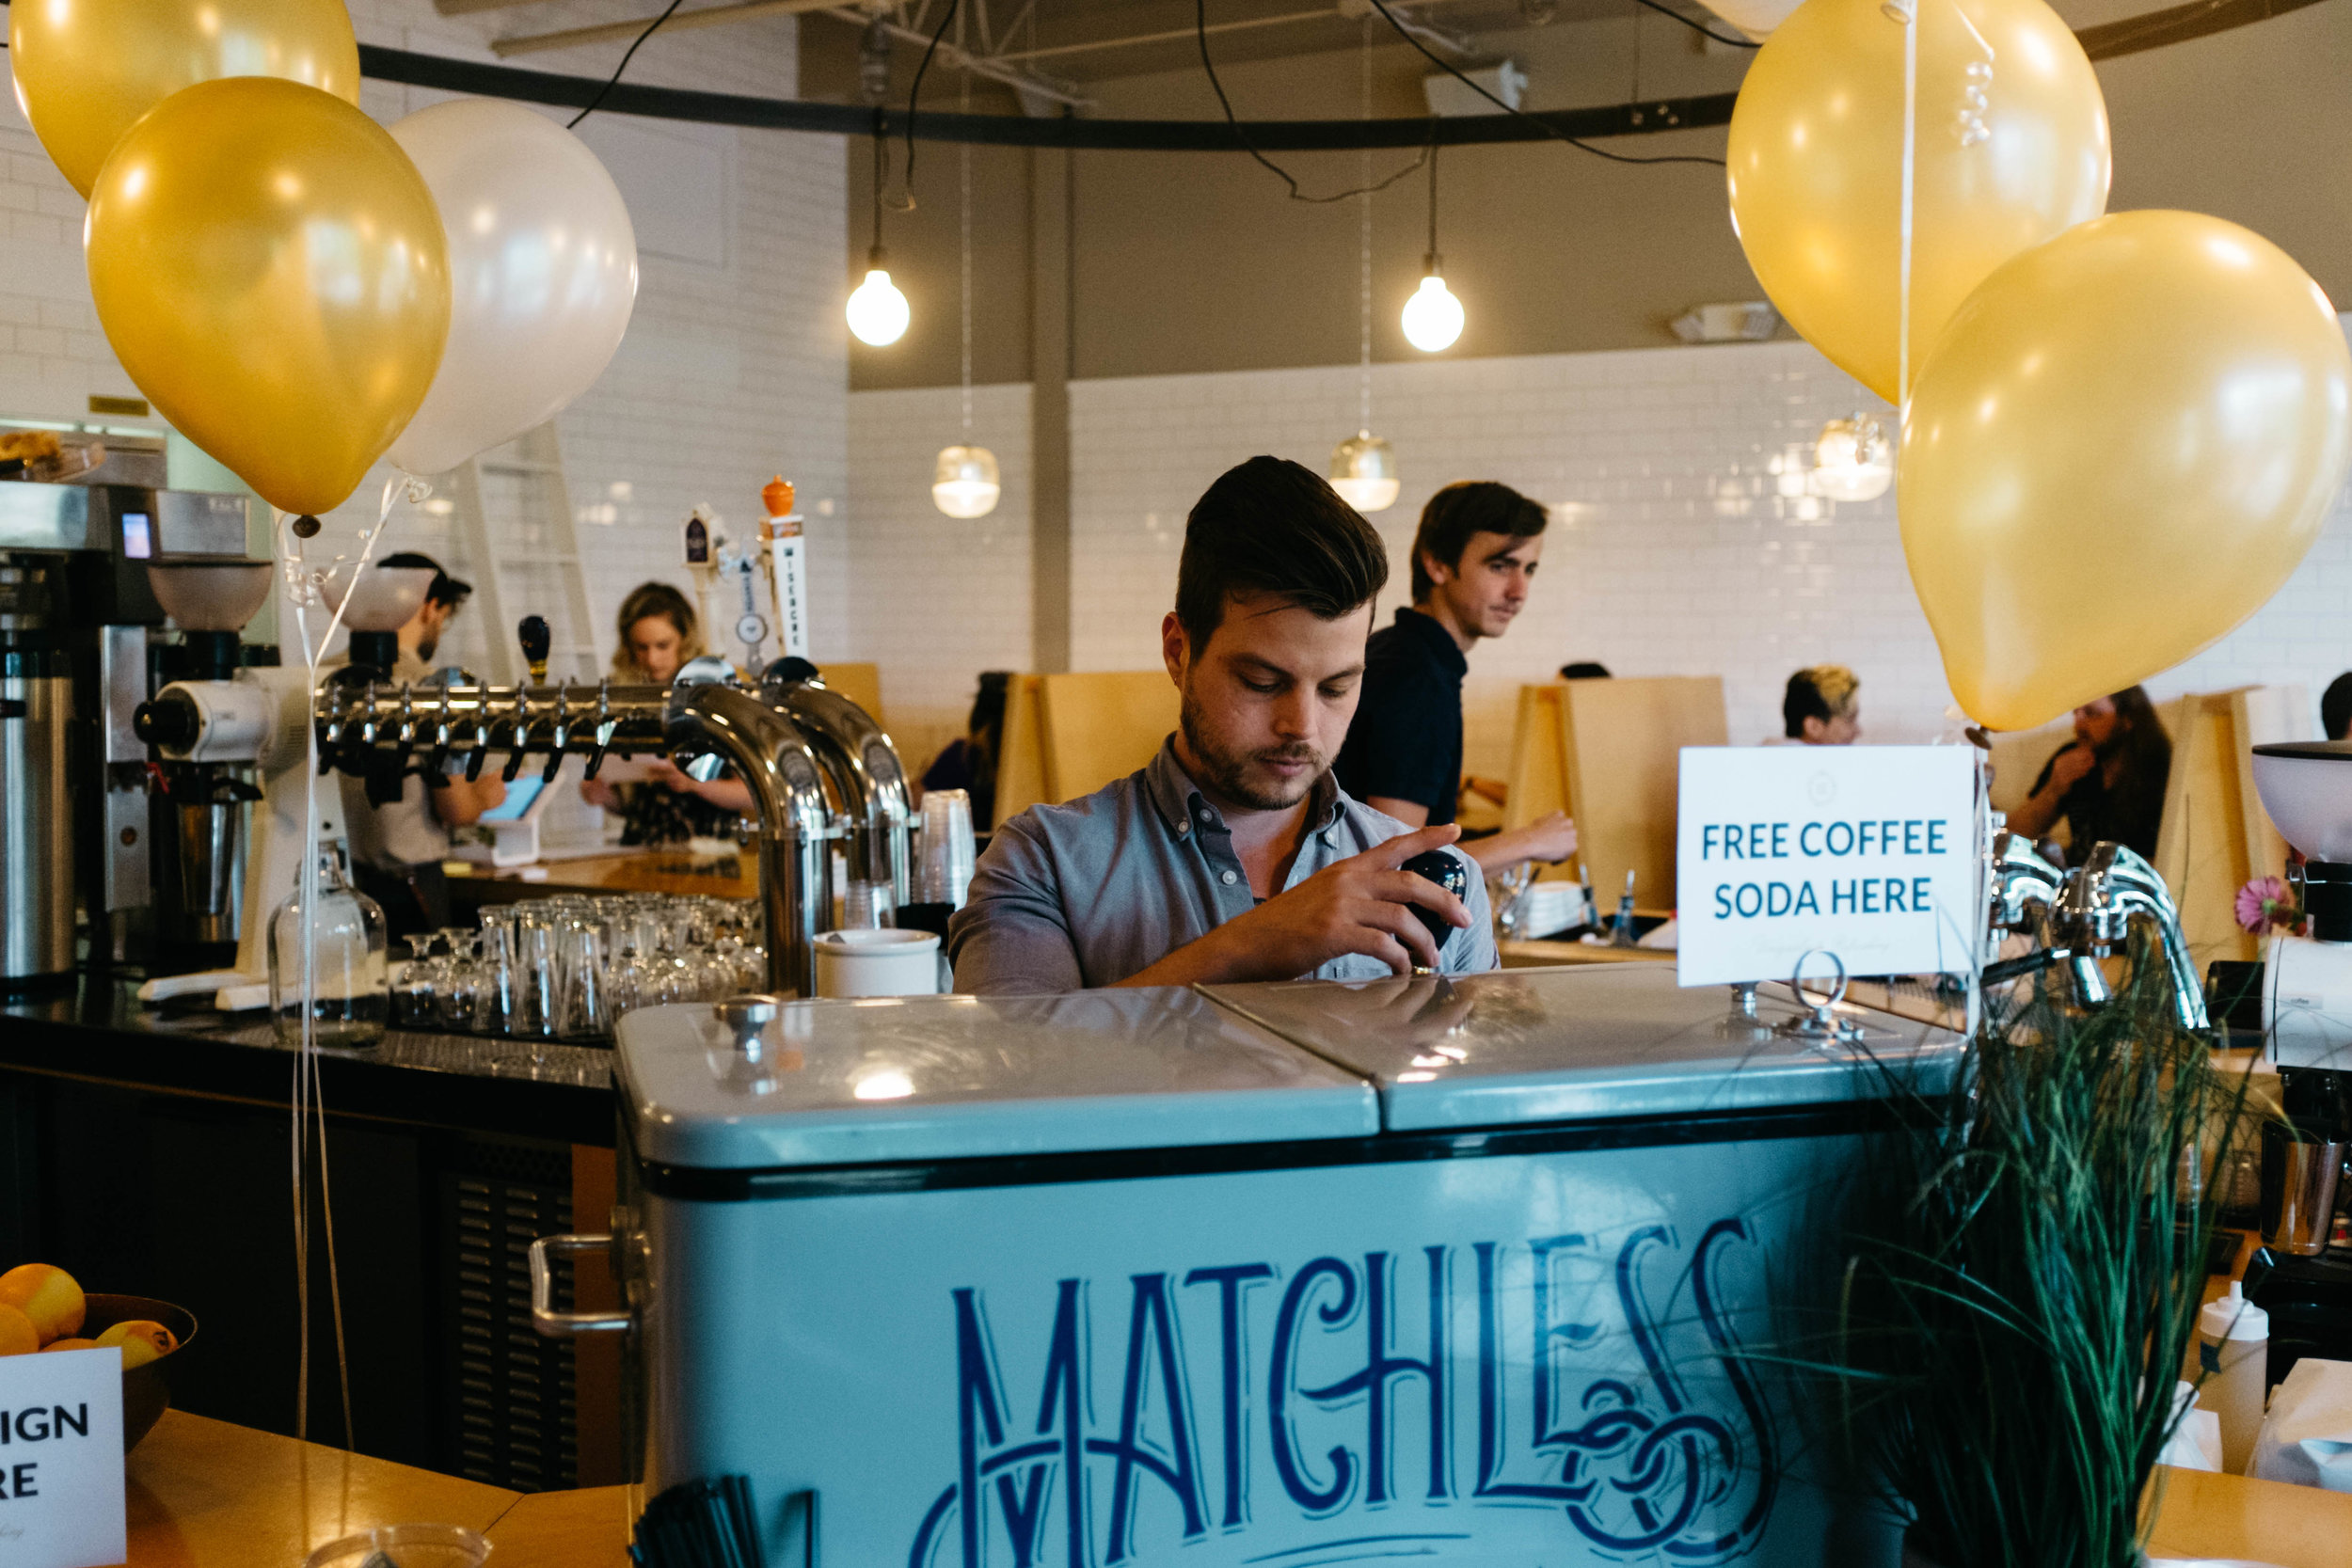 Nathanael Mehrens at the Kickstarter pledge party celebration at Steadfast Coffee.